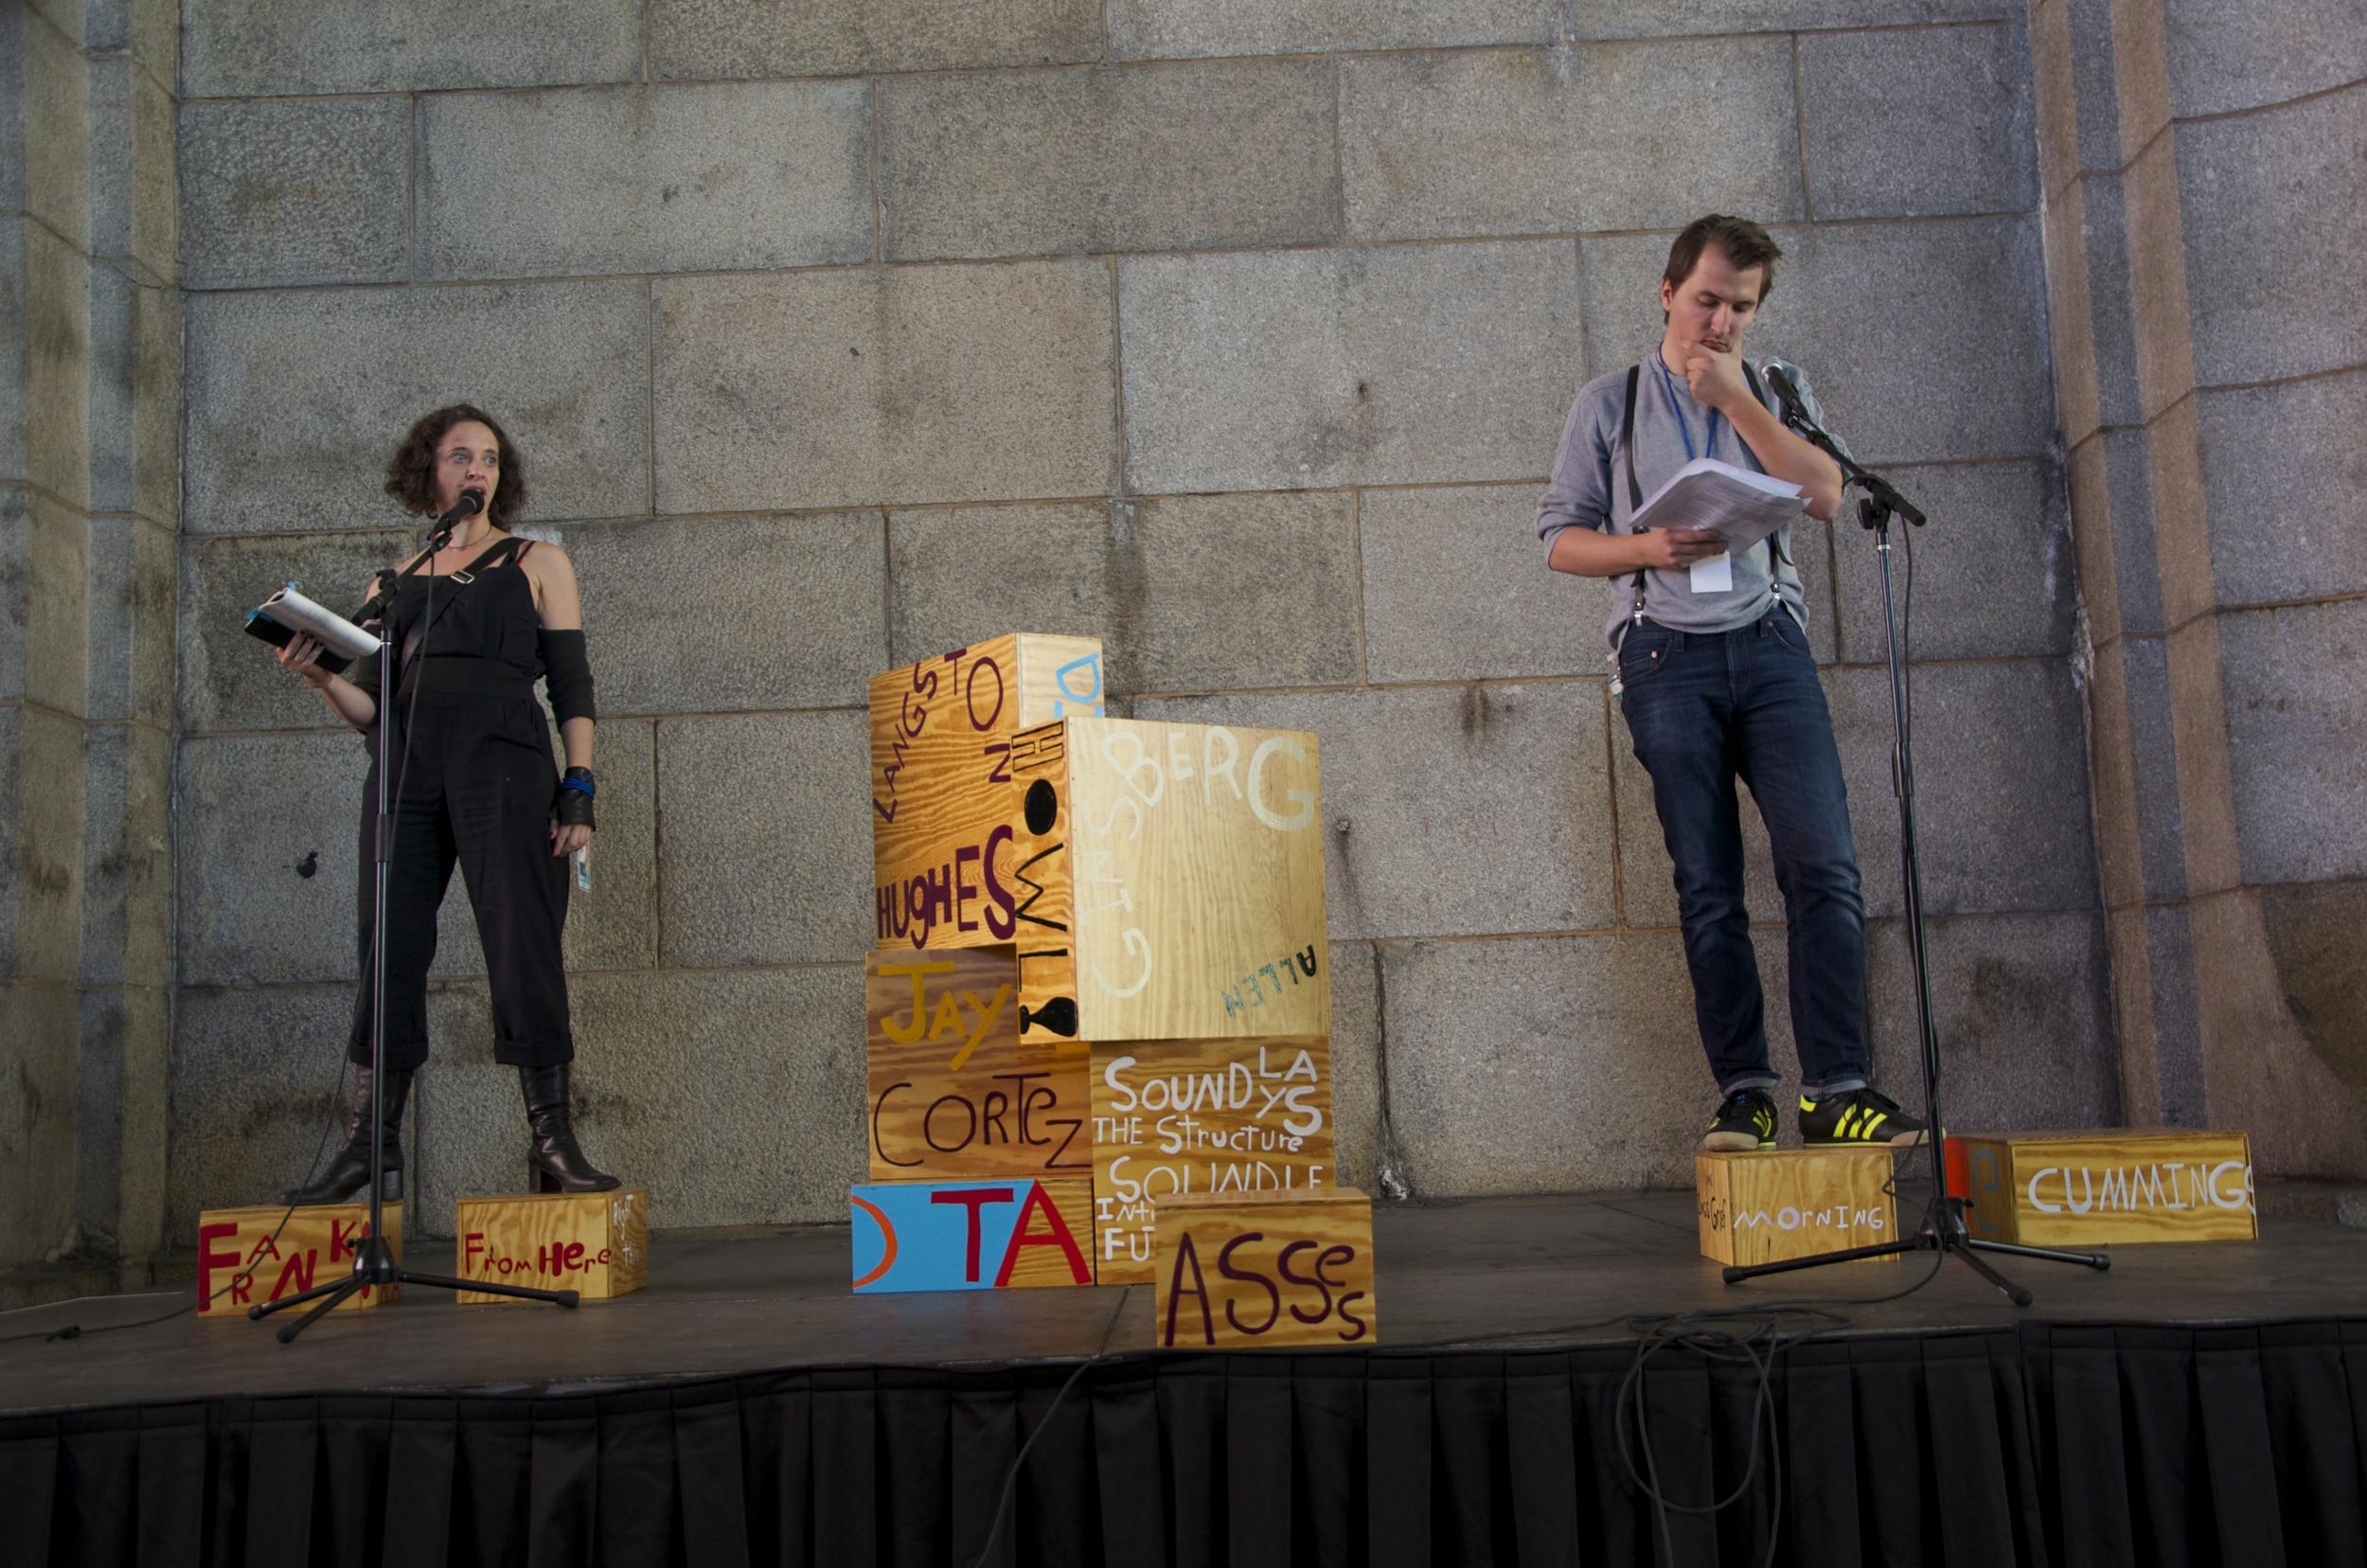 Poet Sculpture, DUMBO Arts Festival, Isak Berbic, Natalia de Campos, Brooklyn, NY 2013.jpg